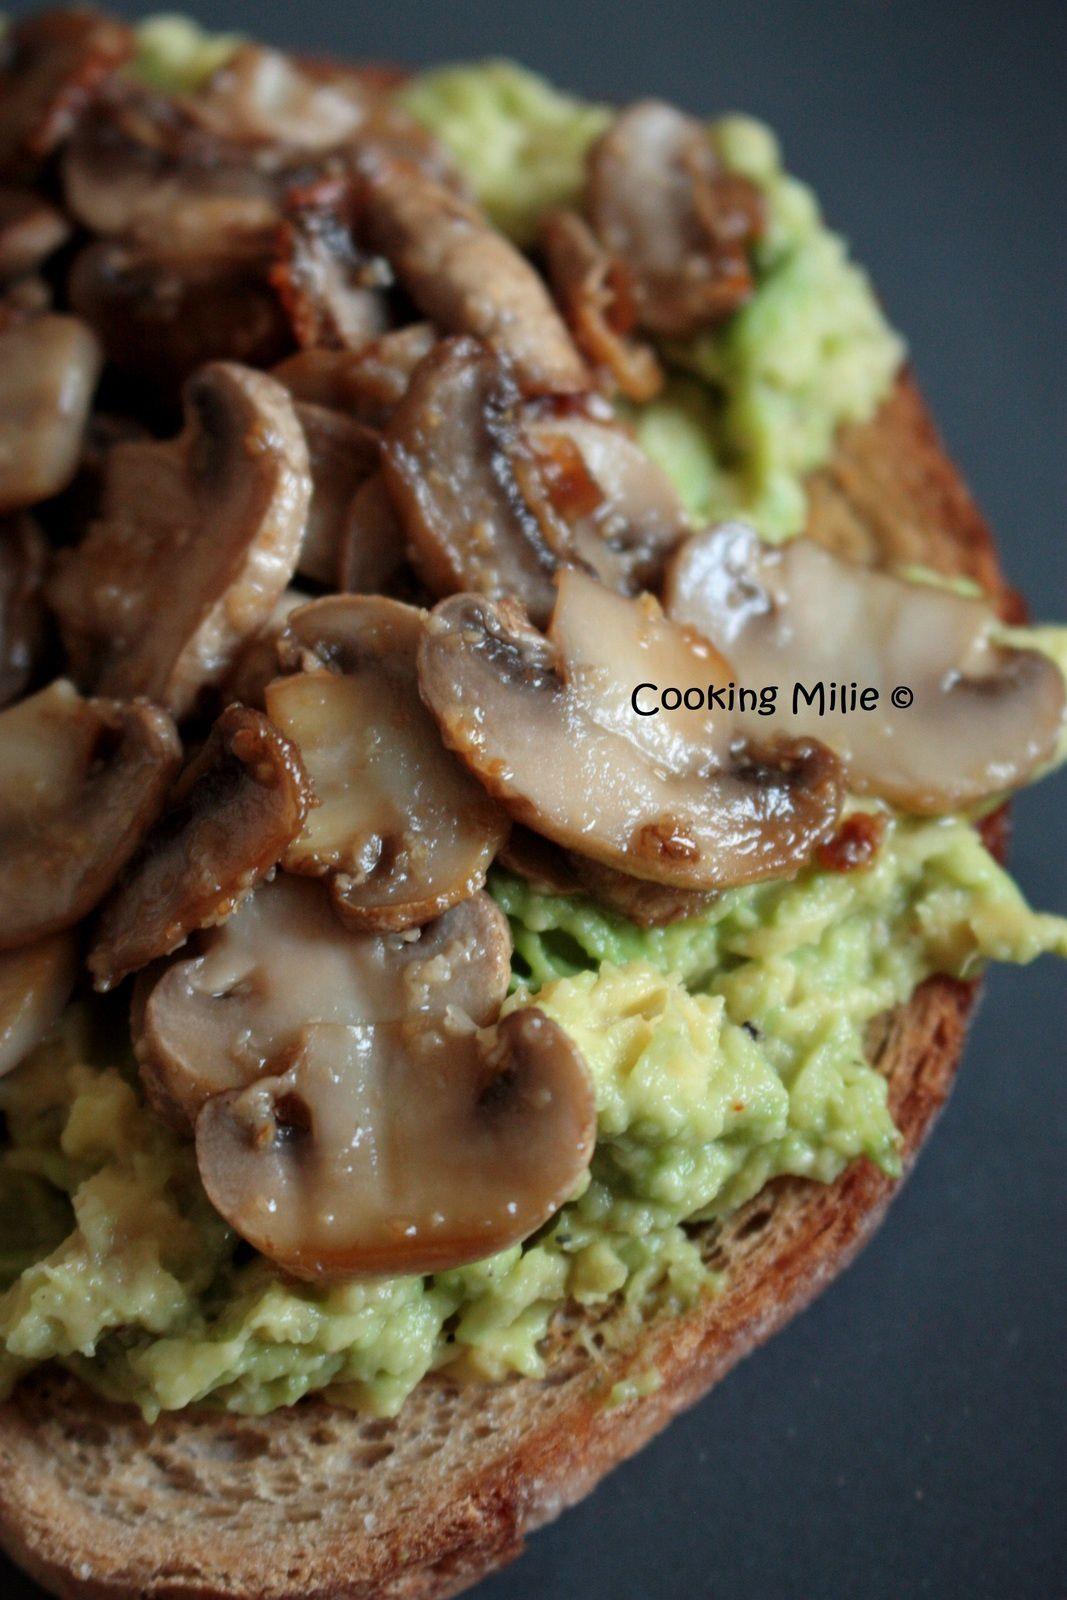 Avocado toast aux champignons de Paris